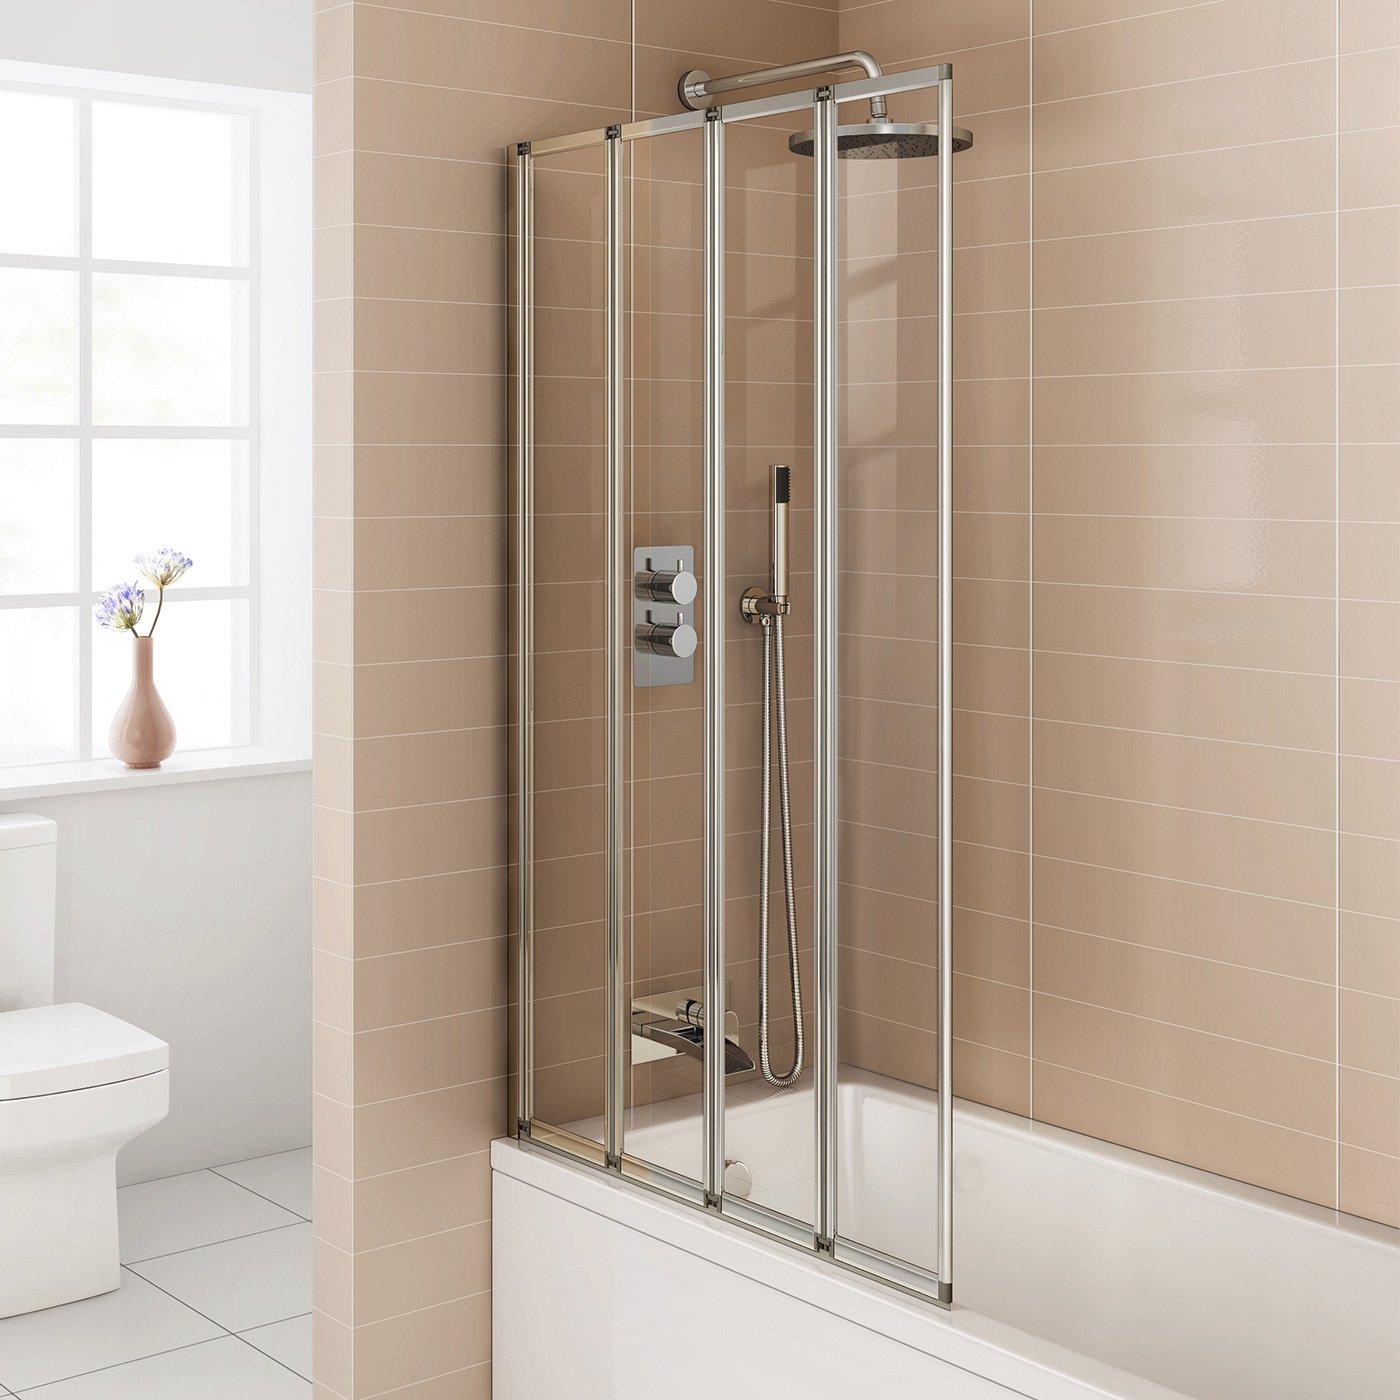 800mm modern pivot folding bath shower glass screen reversible 800mm modern pivot folding bath shower glass screen reversible door panel ibathuk amazon co uk kitchen home